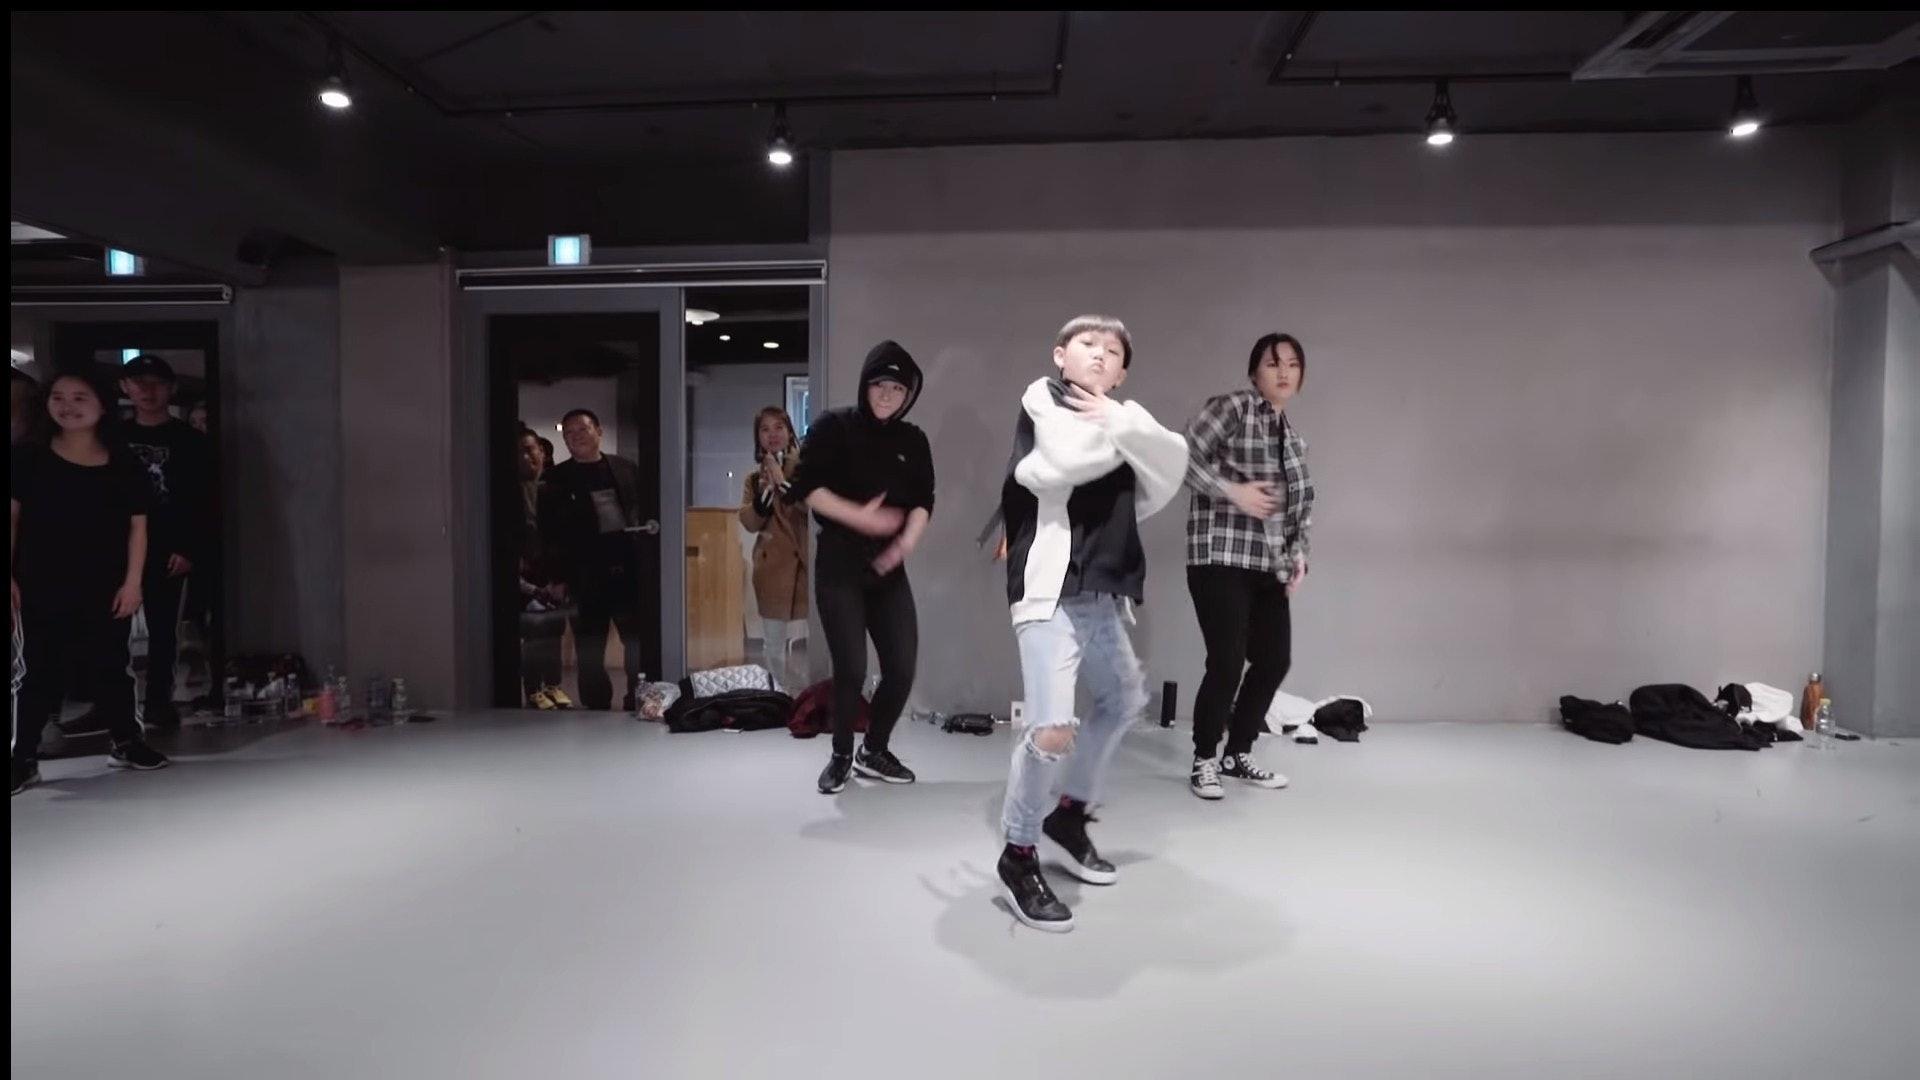 Suren(中)曾在1MILLION Dance Studio學跳舞,並在其影片中大騷舞技。(影片截圖)